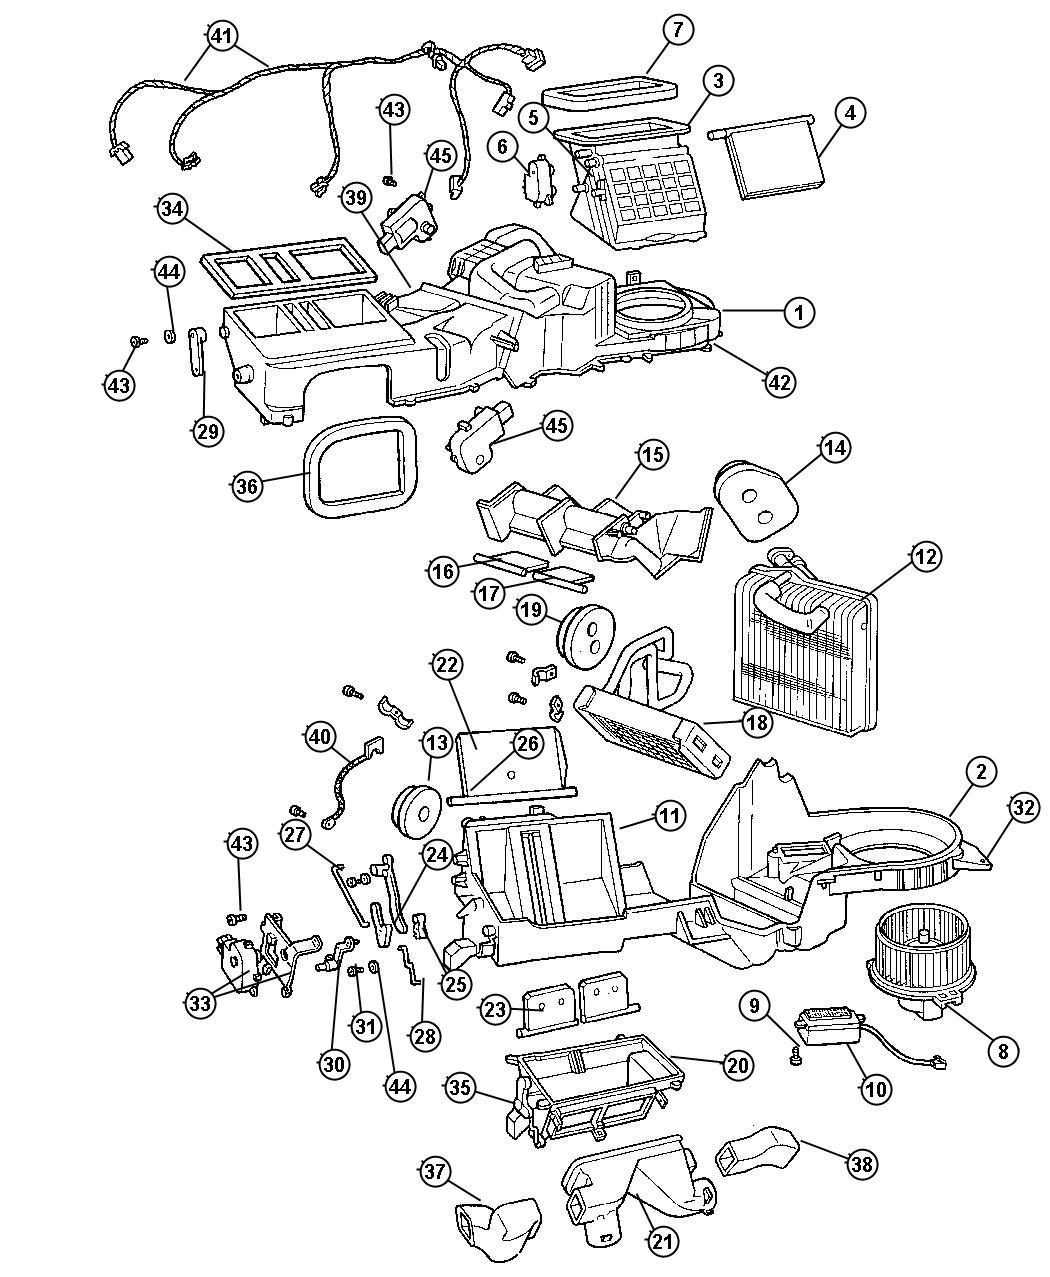 tags: #ezgo wiring diagram#nissan wiring diagrams electric#1993 nissan  pickup wiring diagram#2004 nissan maxima wiring diagram#2010 nissan  pathfinder wiring